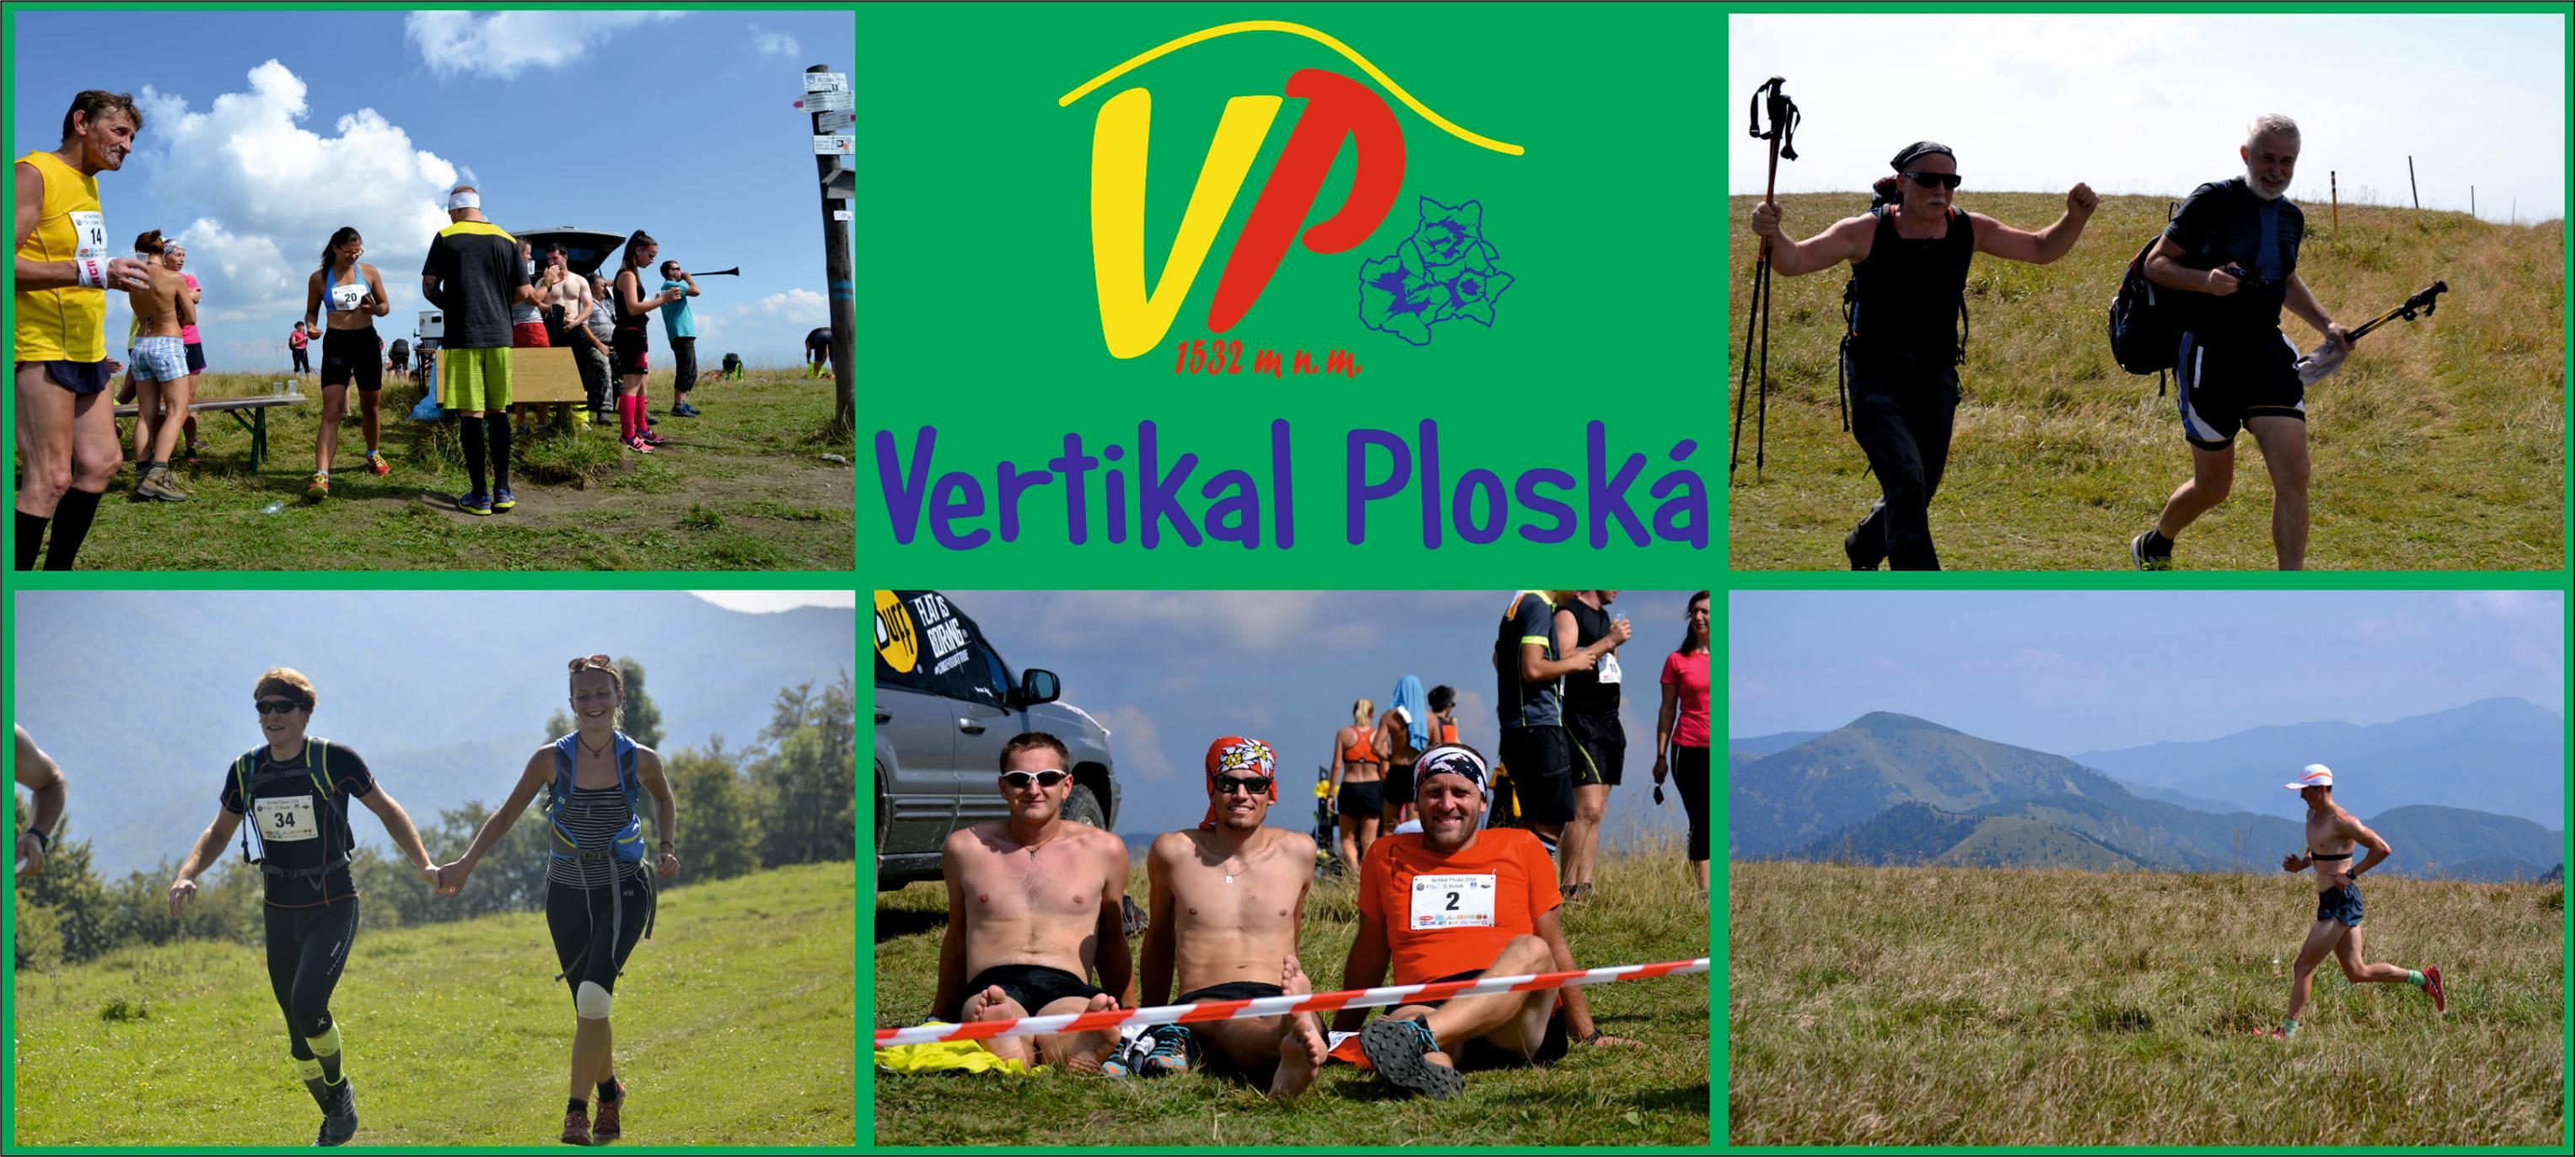 Expresky z hôr 76 - Vertikal Ploská 2017, zdroj: FB page vertikalploska